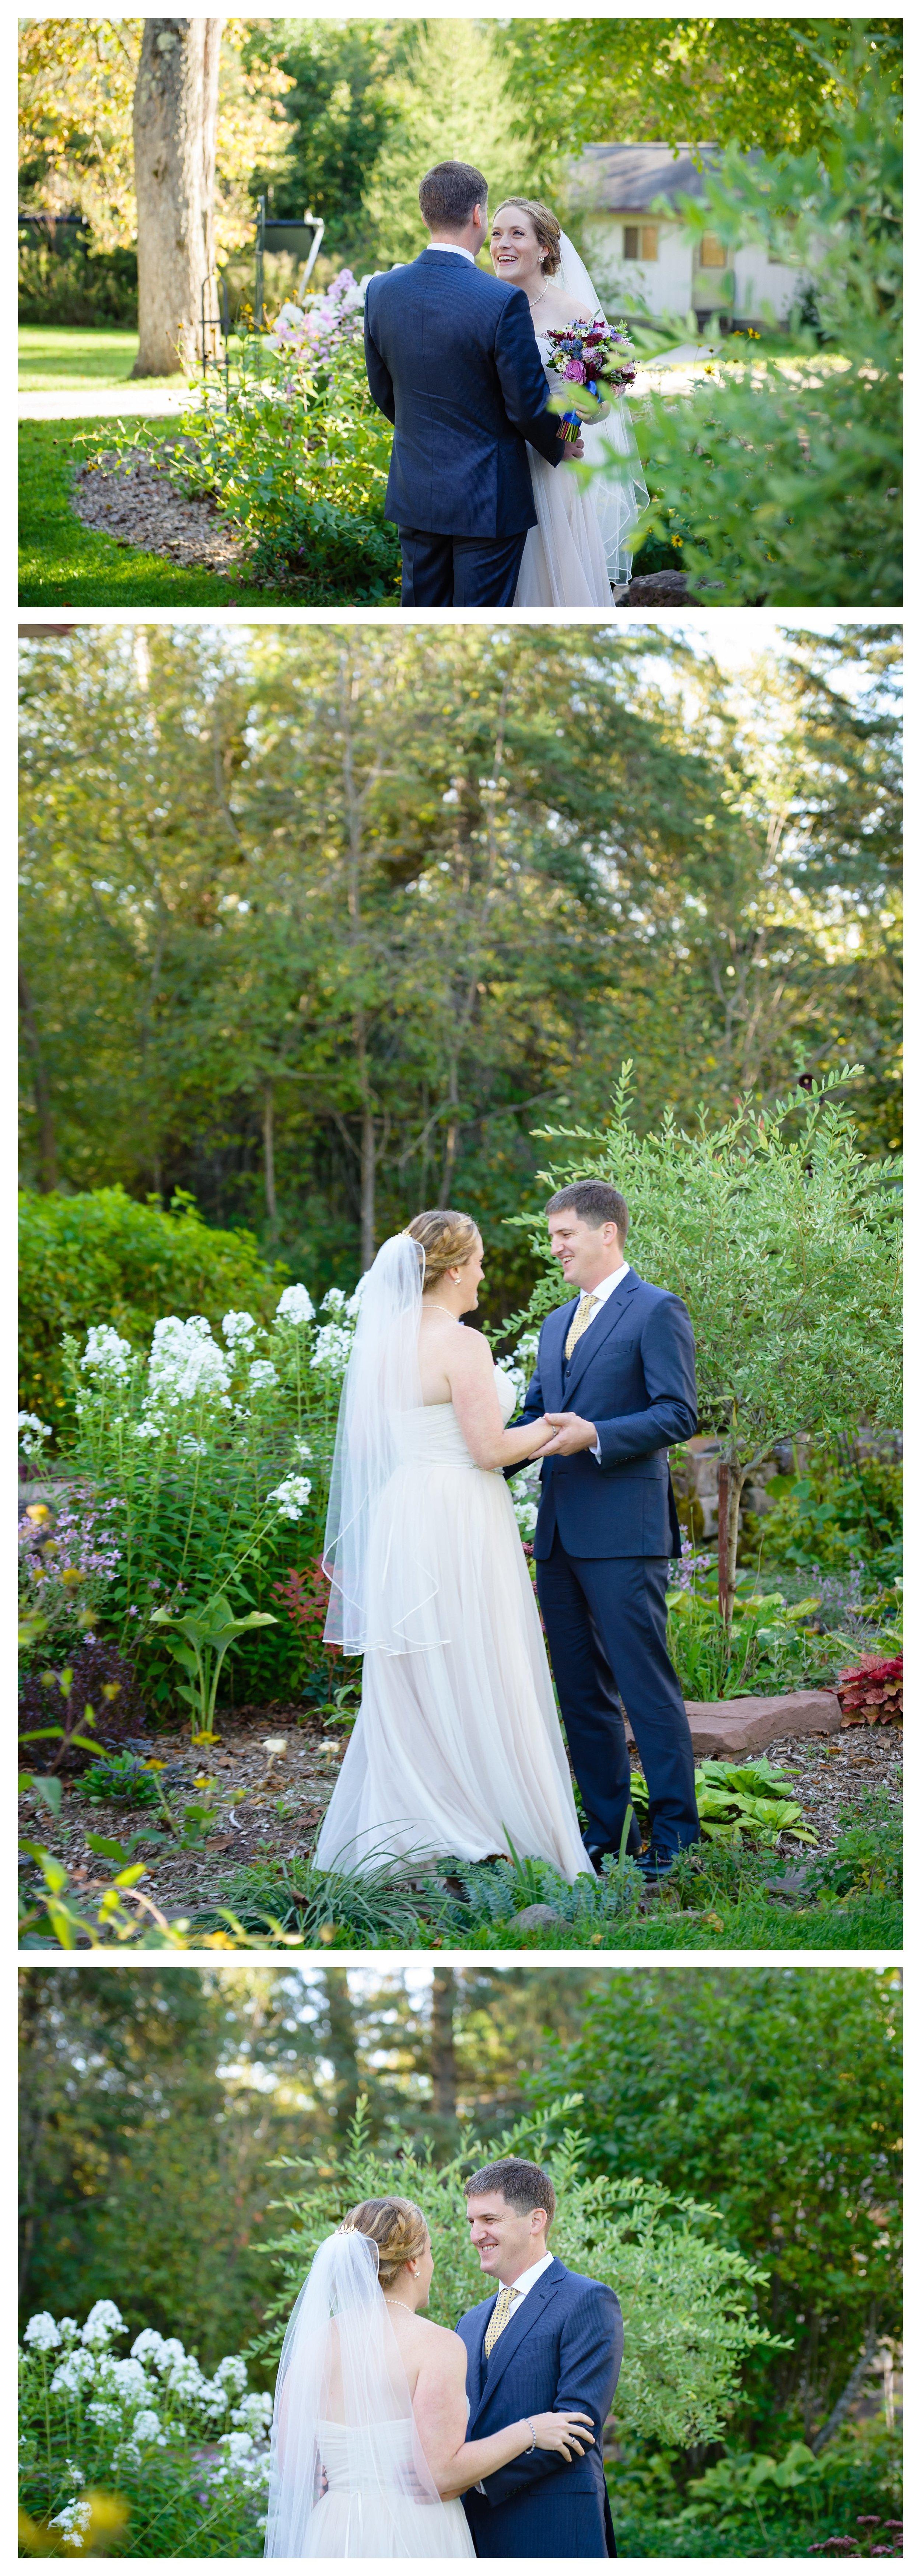 Lindstrom MN Twin cities Minnesota northwoods Bayfield wisconsin destination wedding ps 139 photography_0469.jpg